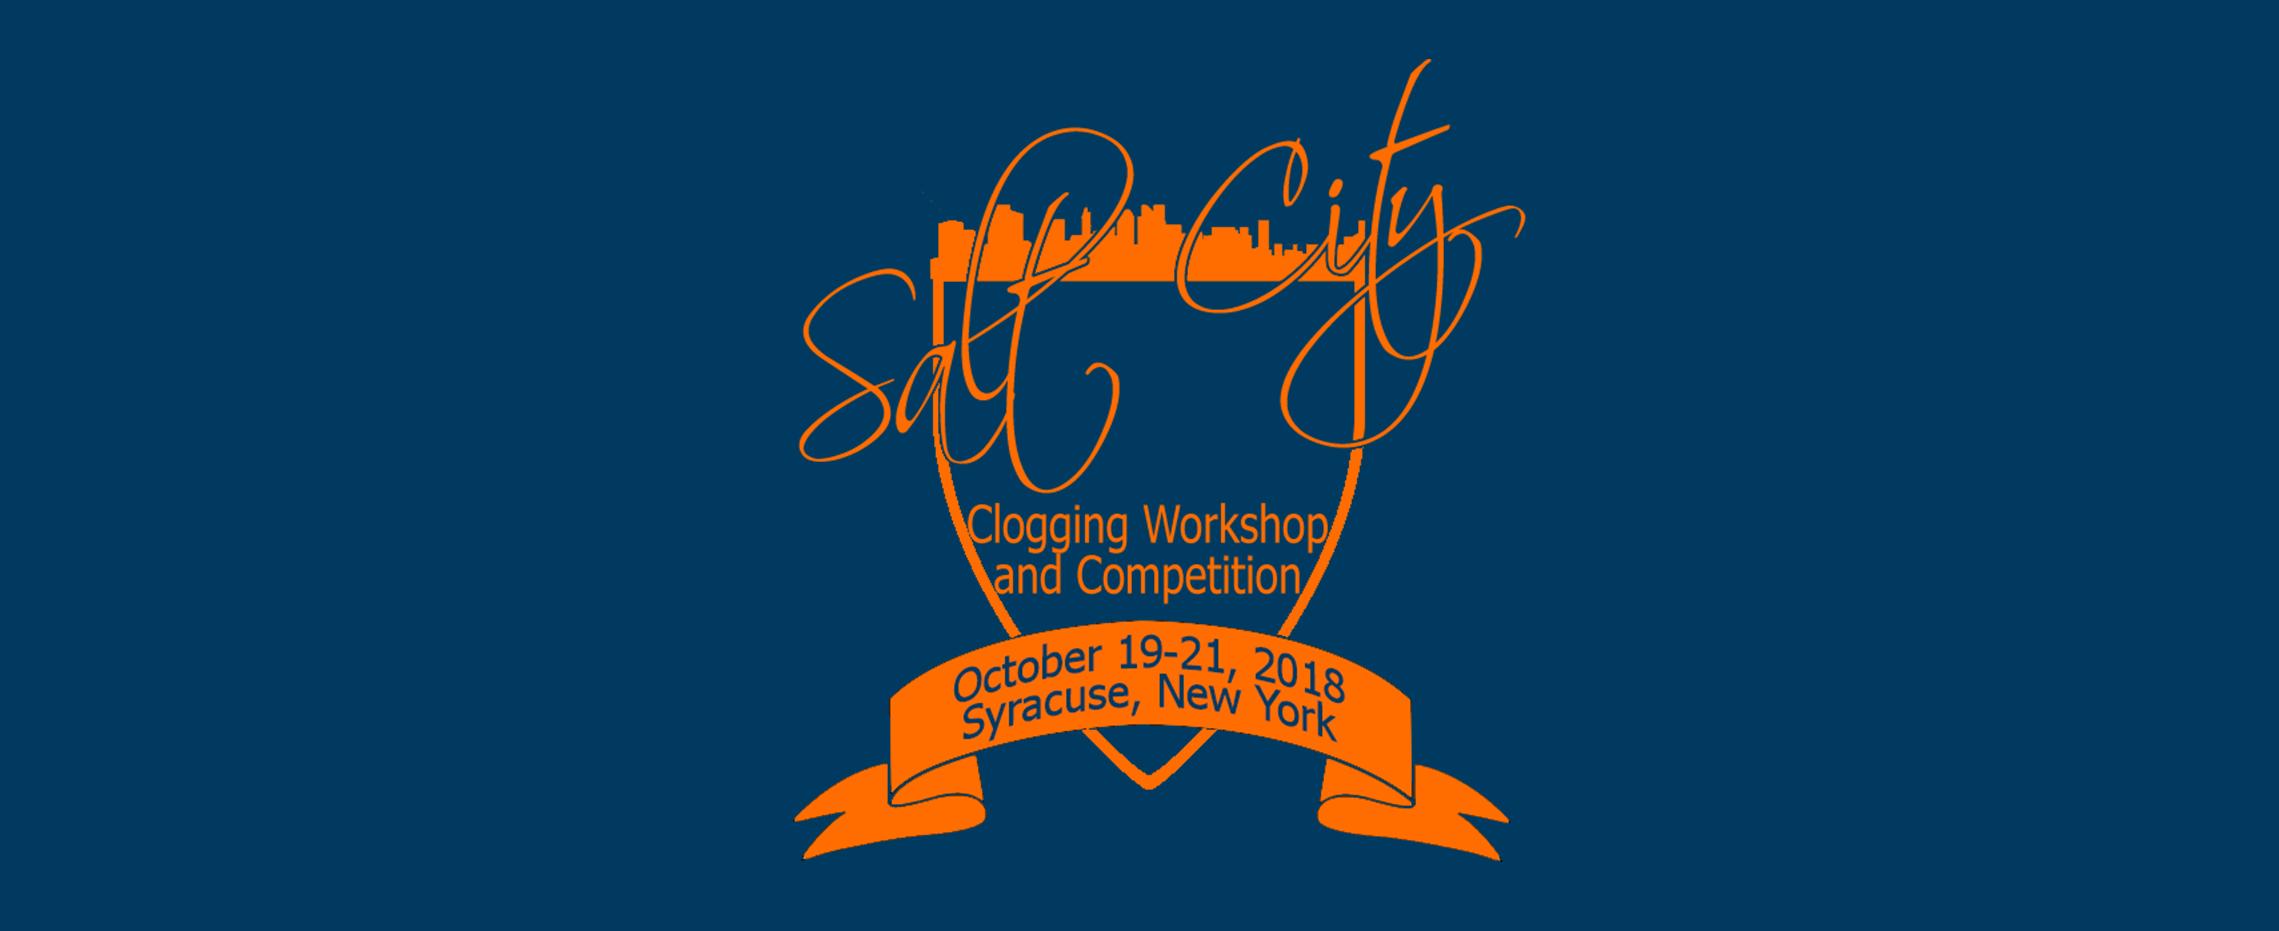 Western New York Cloggers Association